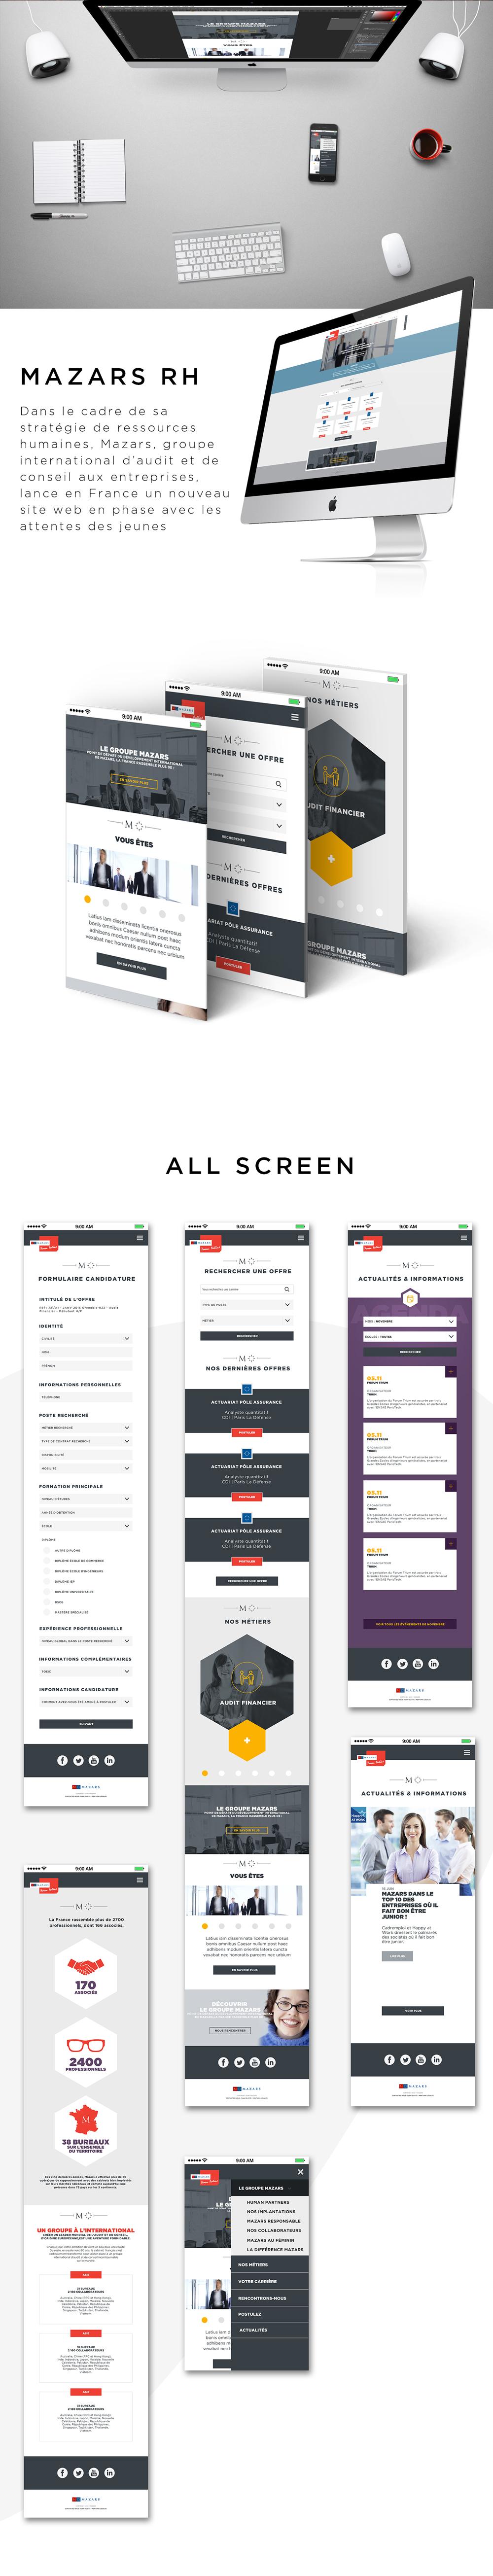 Design-app-mazars-rh